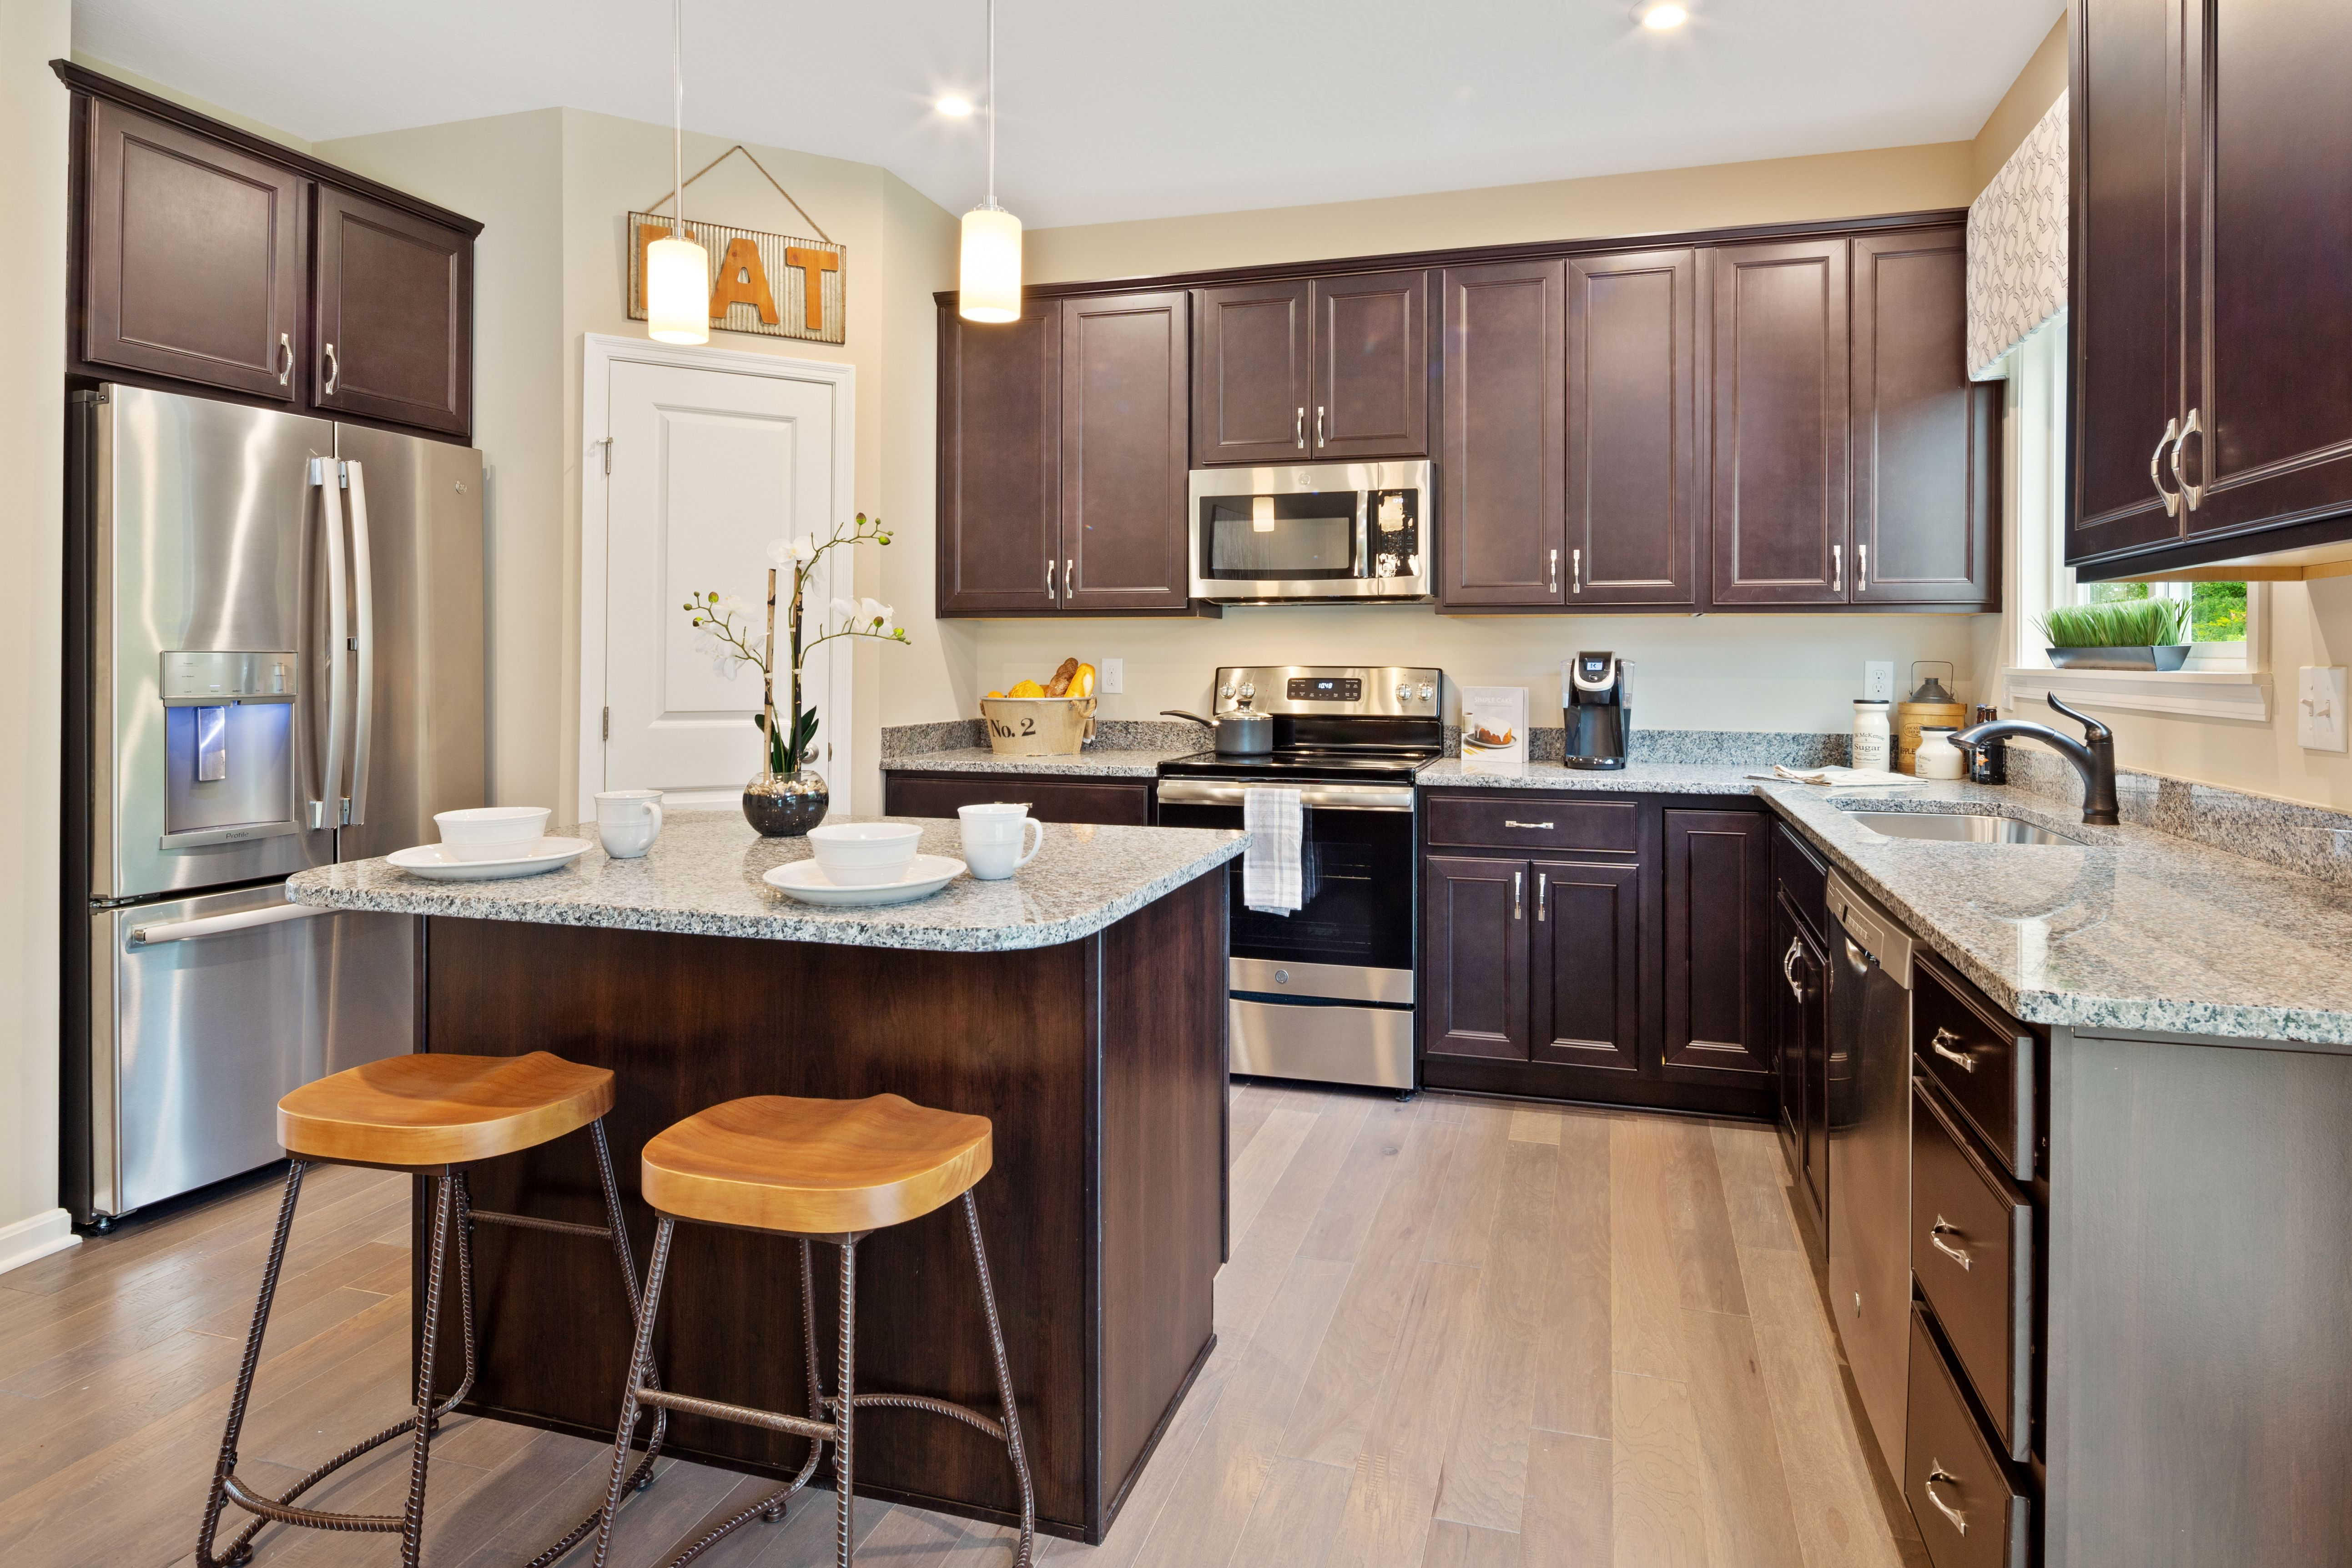 Kitchen featured in the Yosemite By Fischer Homes  in Dayton-Springfield, OH